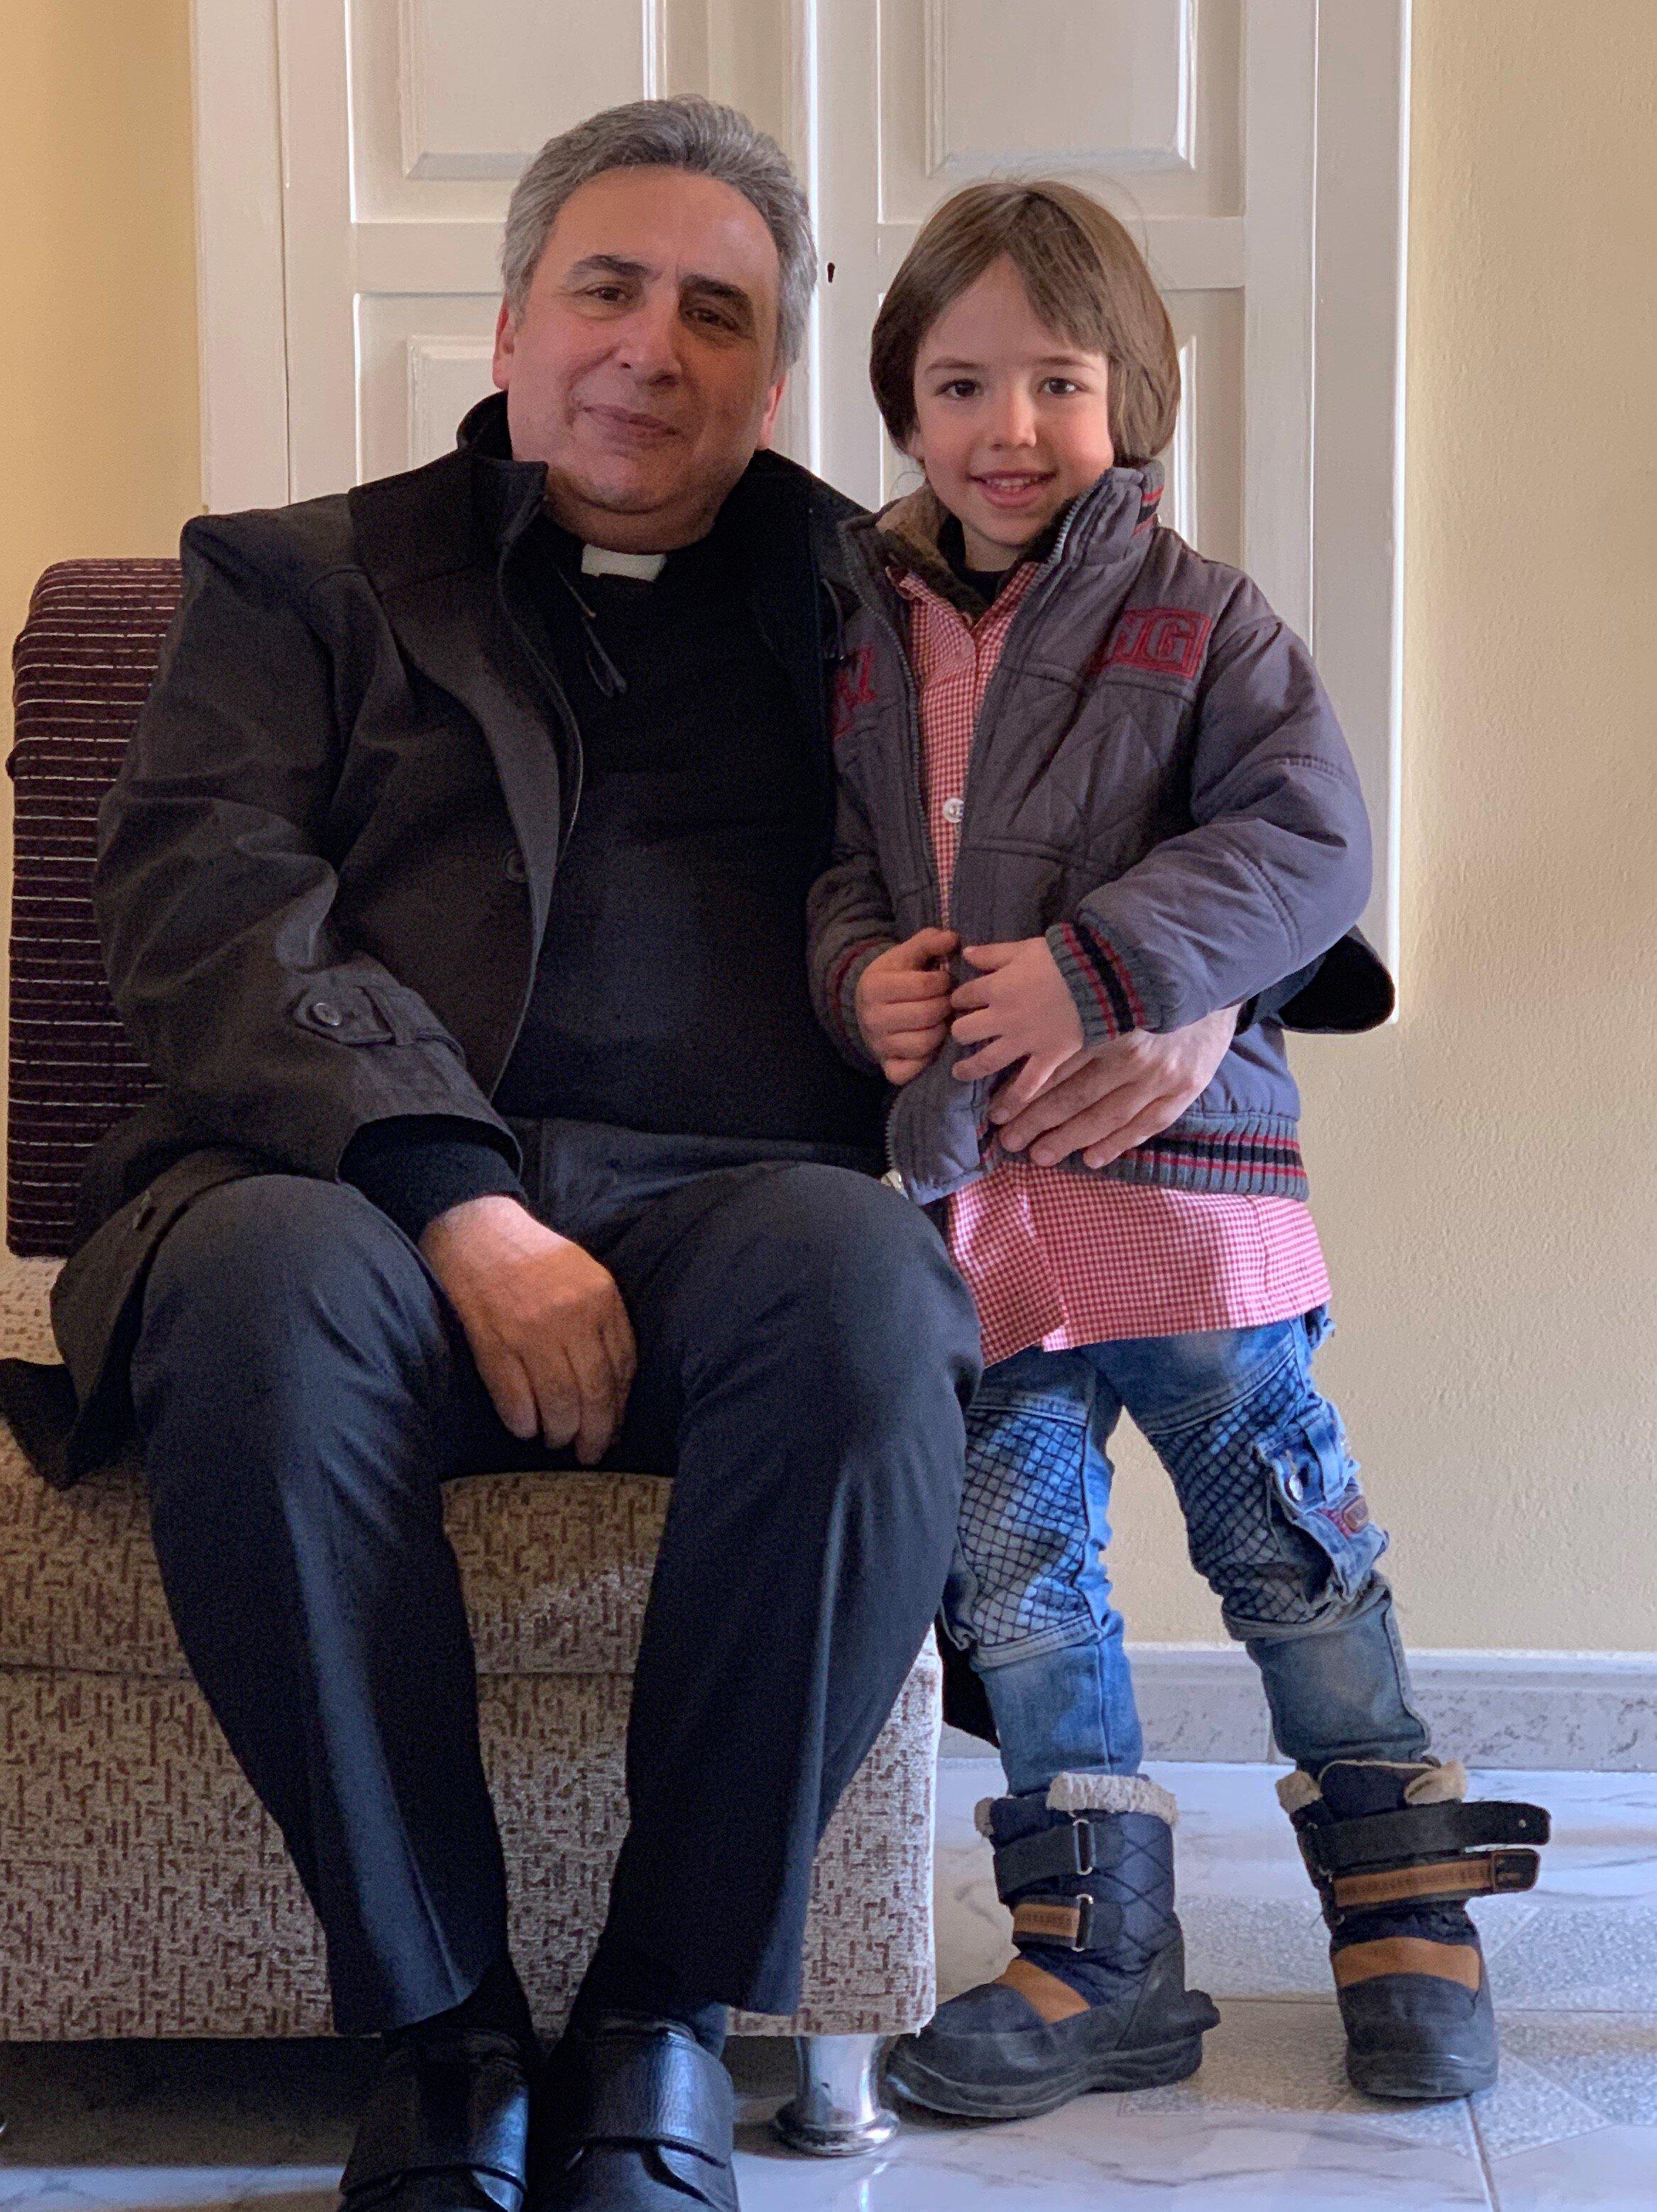 Rev Joseph Kassab on our visit to Nabek Church. Last fall, Joseph baptized young Christian, seen here.